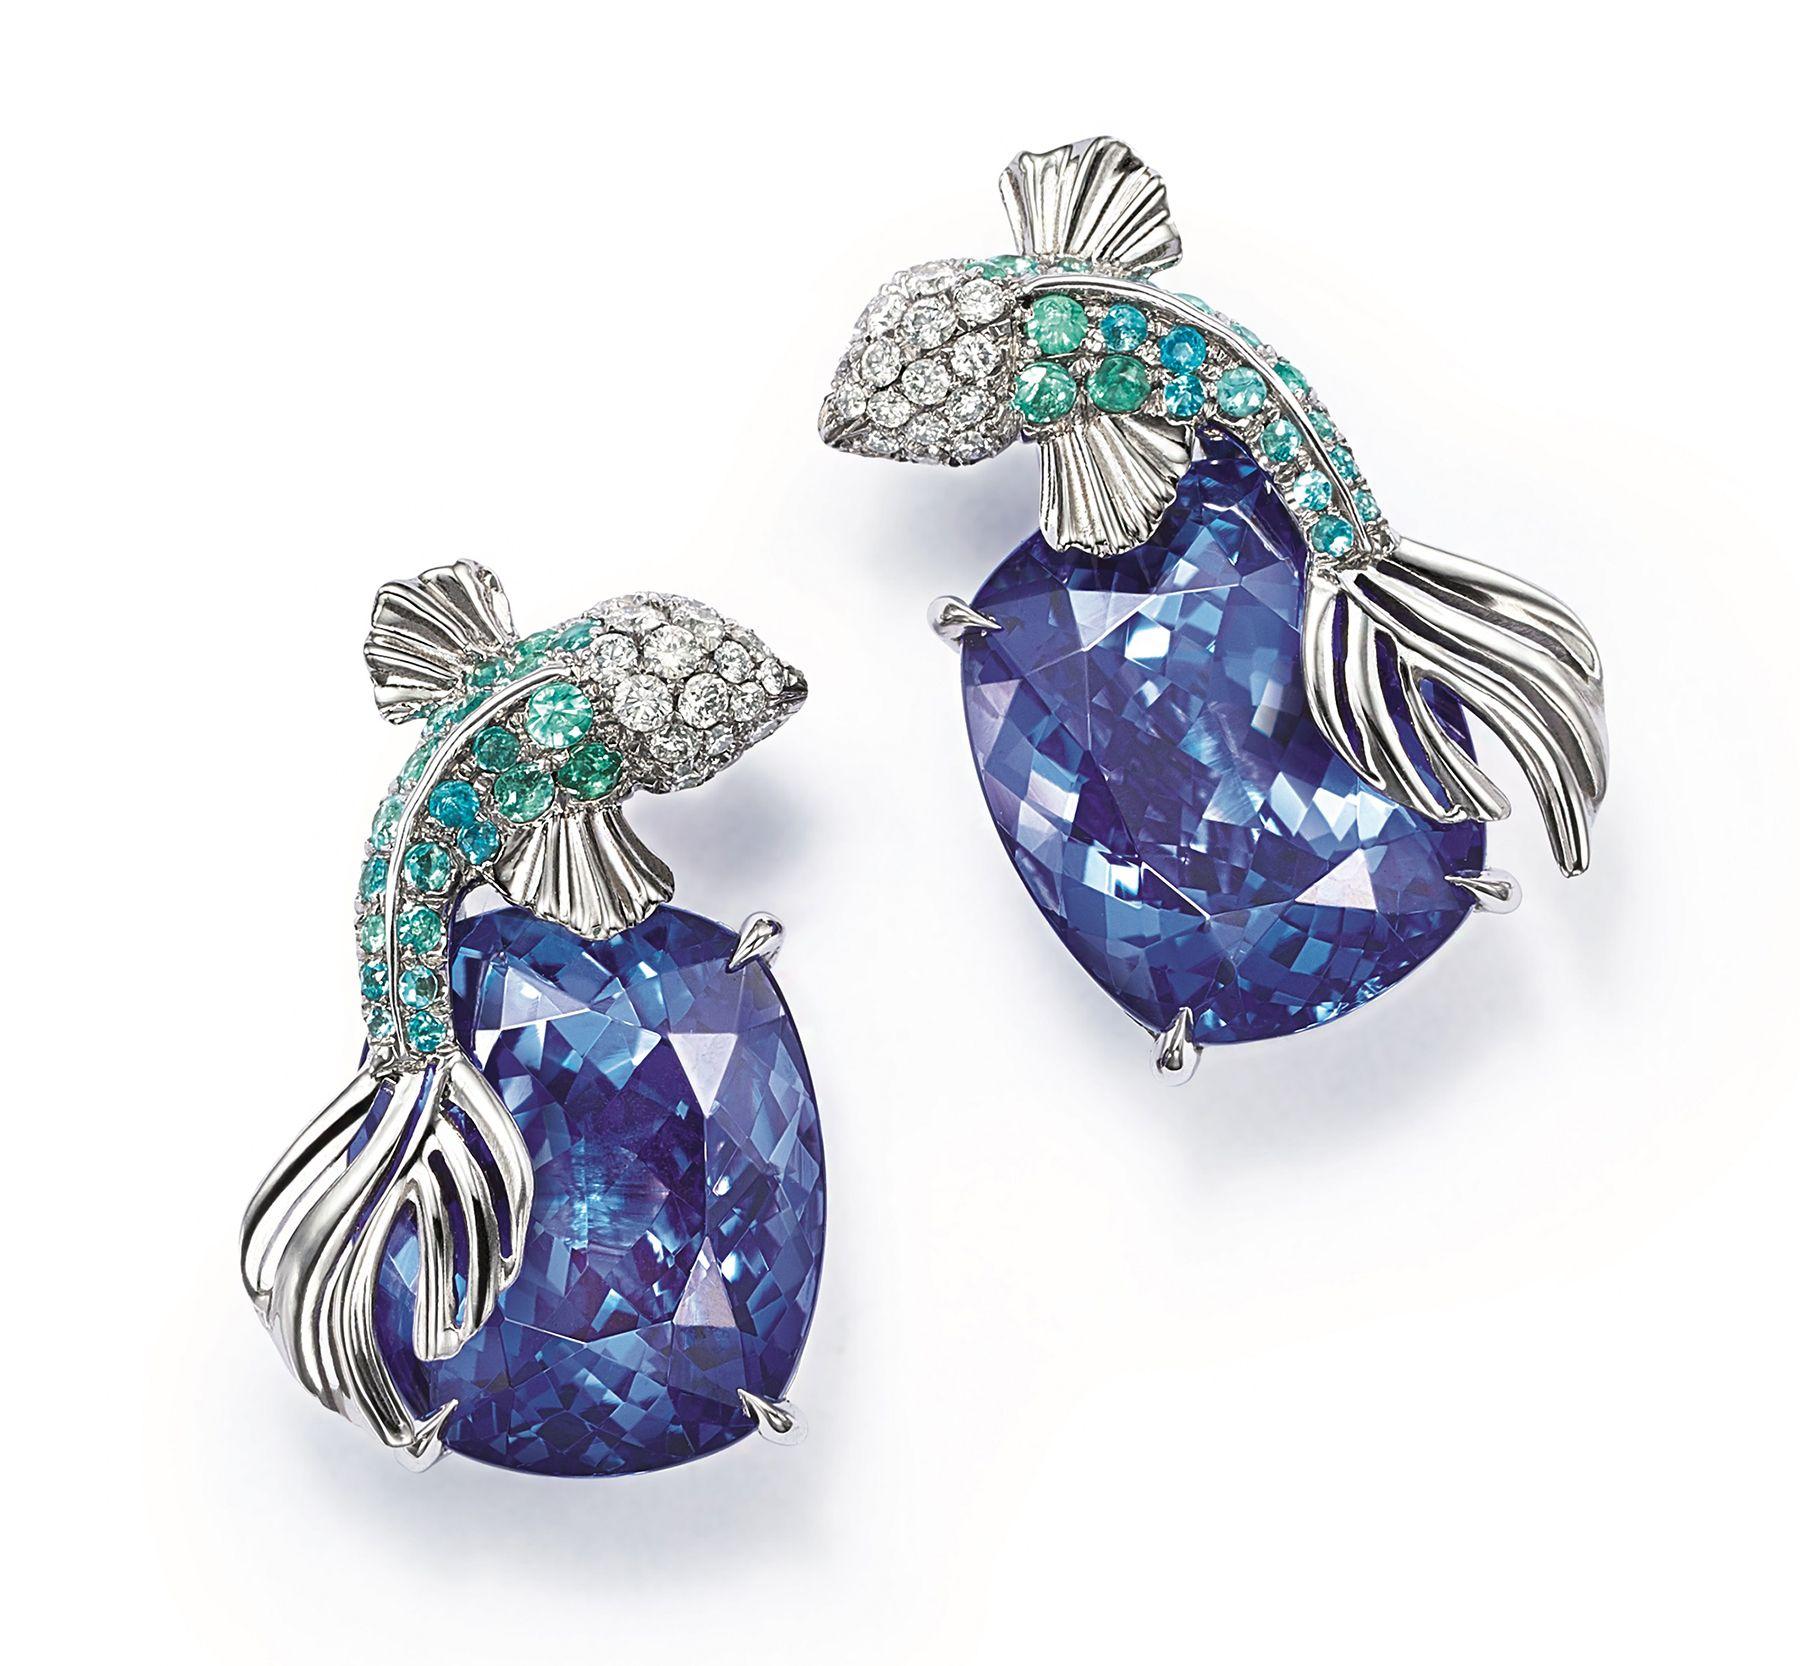 Tiffany Co Blue Book 2017 Tanzanite Marine Earrings